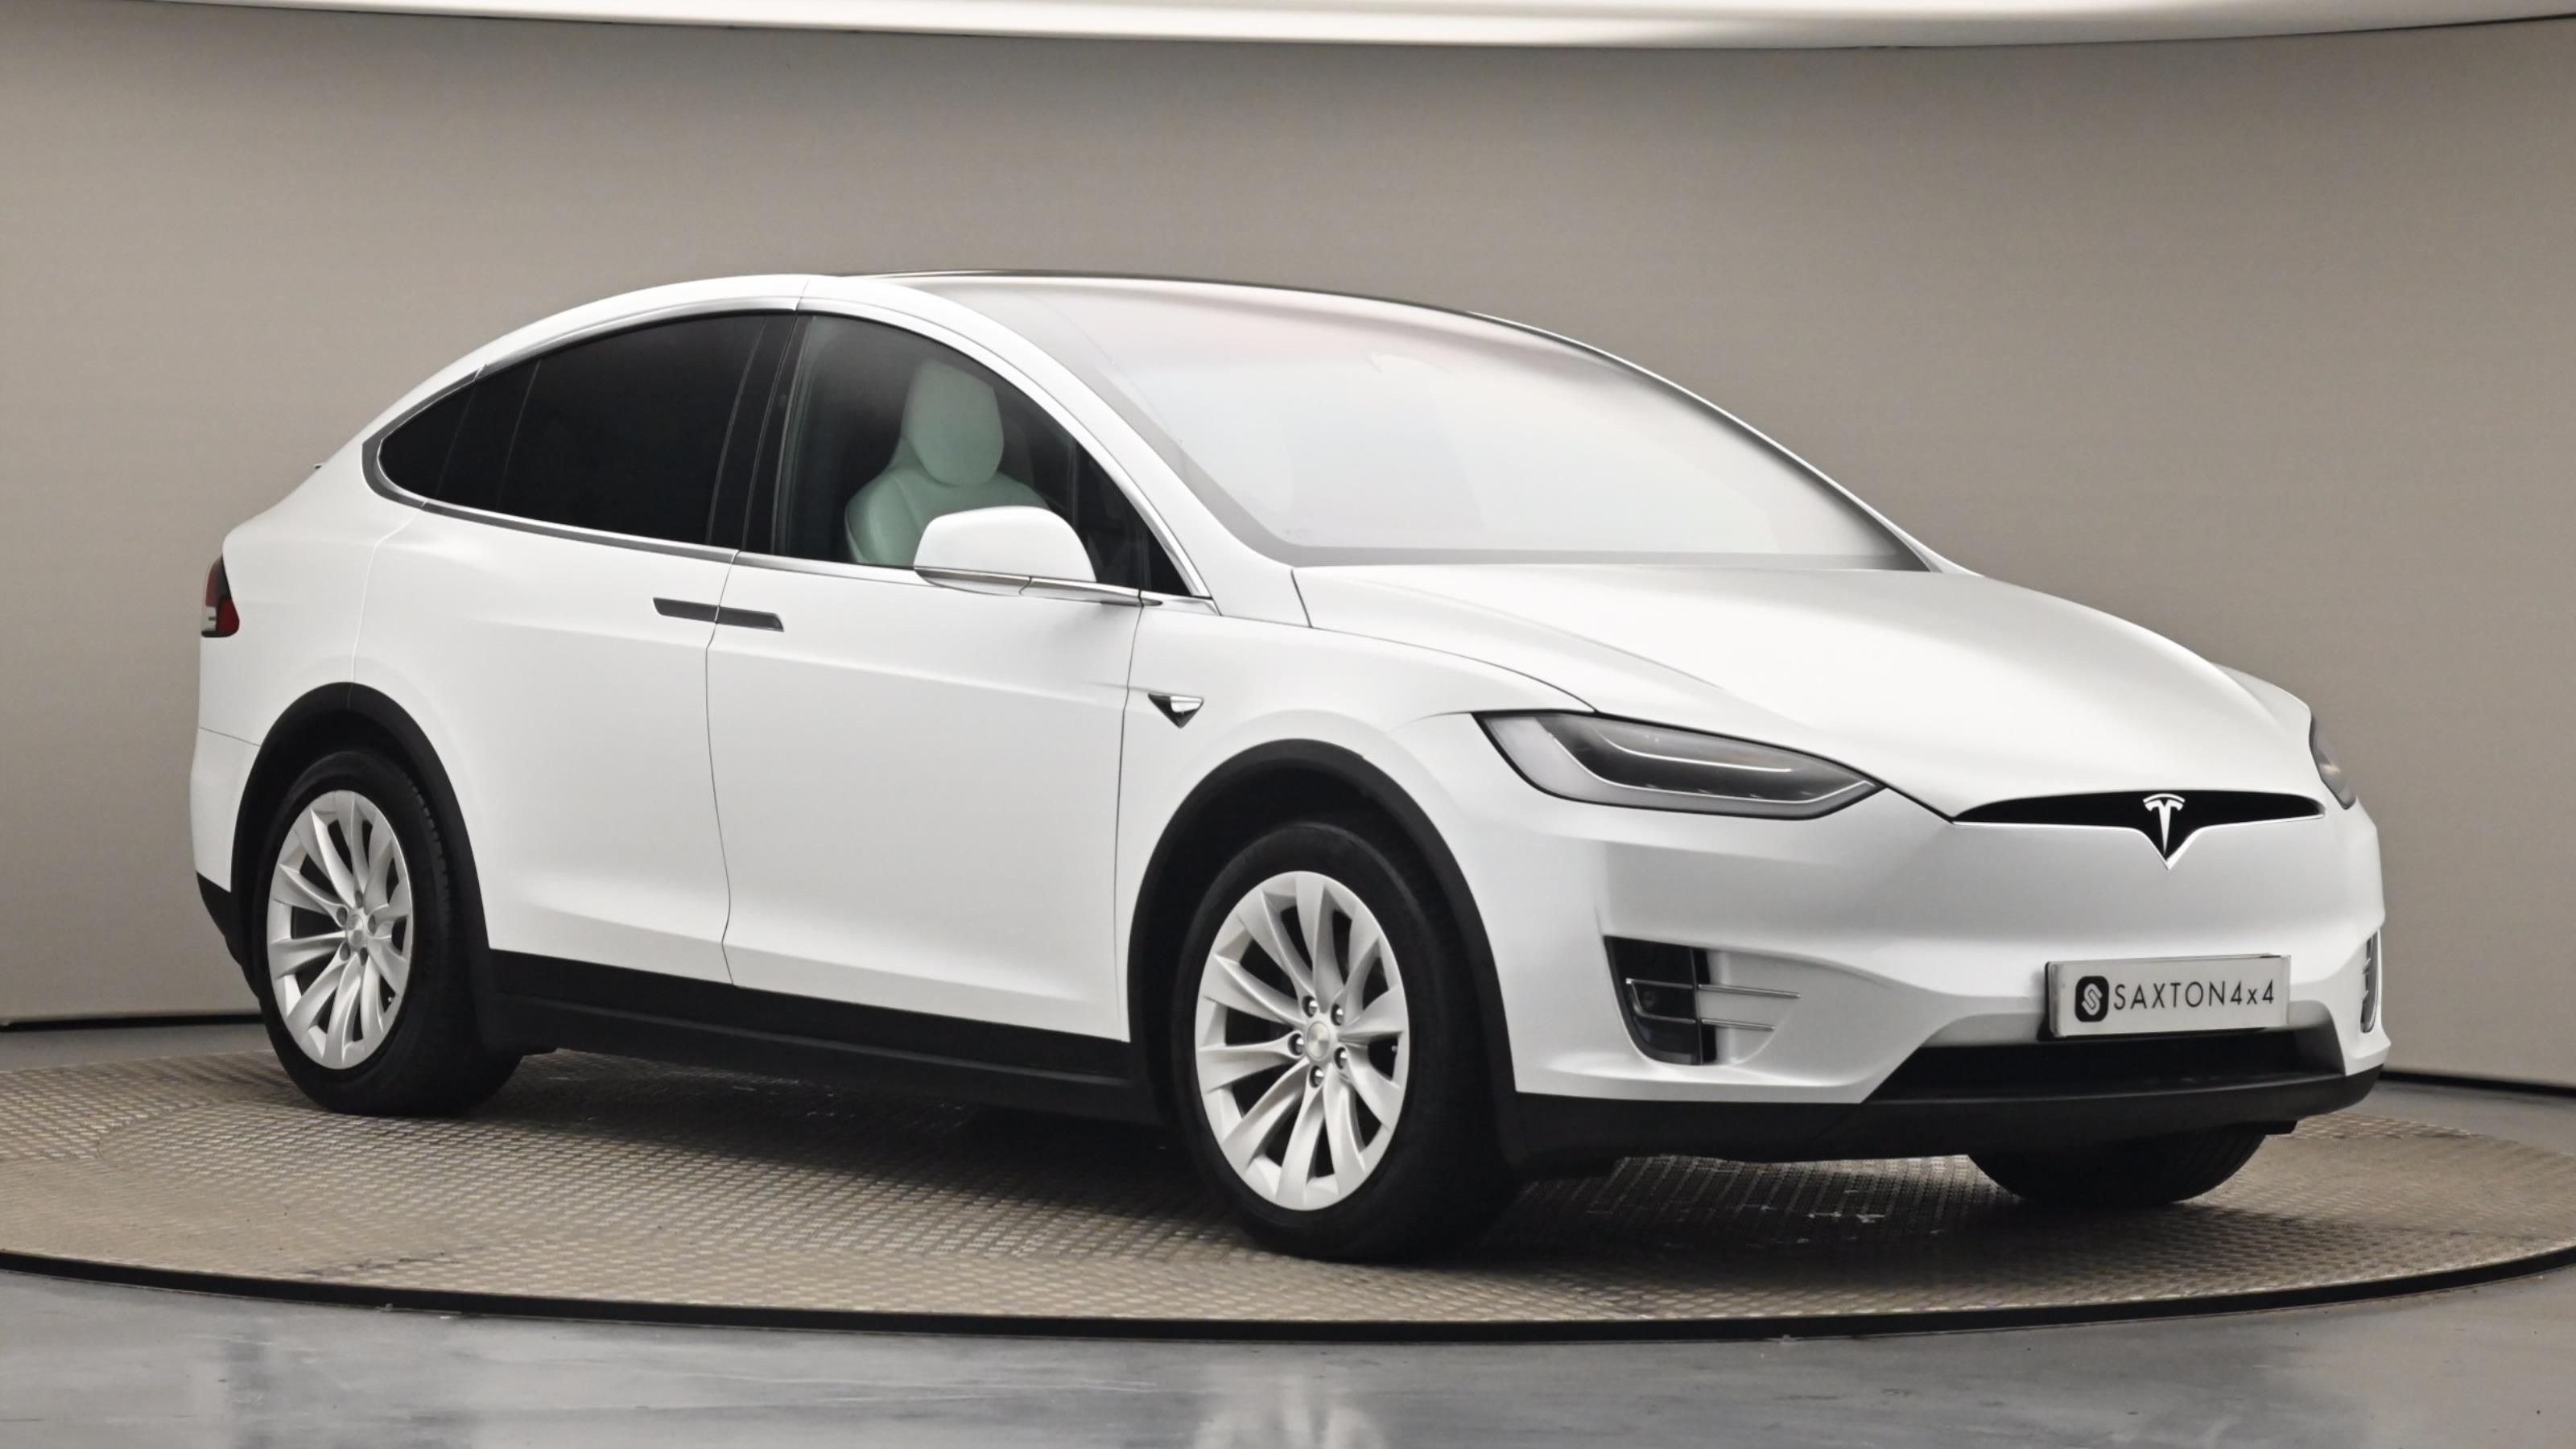 Used 2018 Tesla MODEL X 449kW 100kWh Dual Motor 5dr Auto White at Saxton4x4